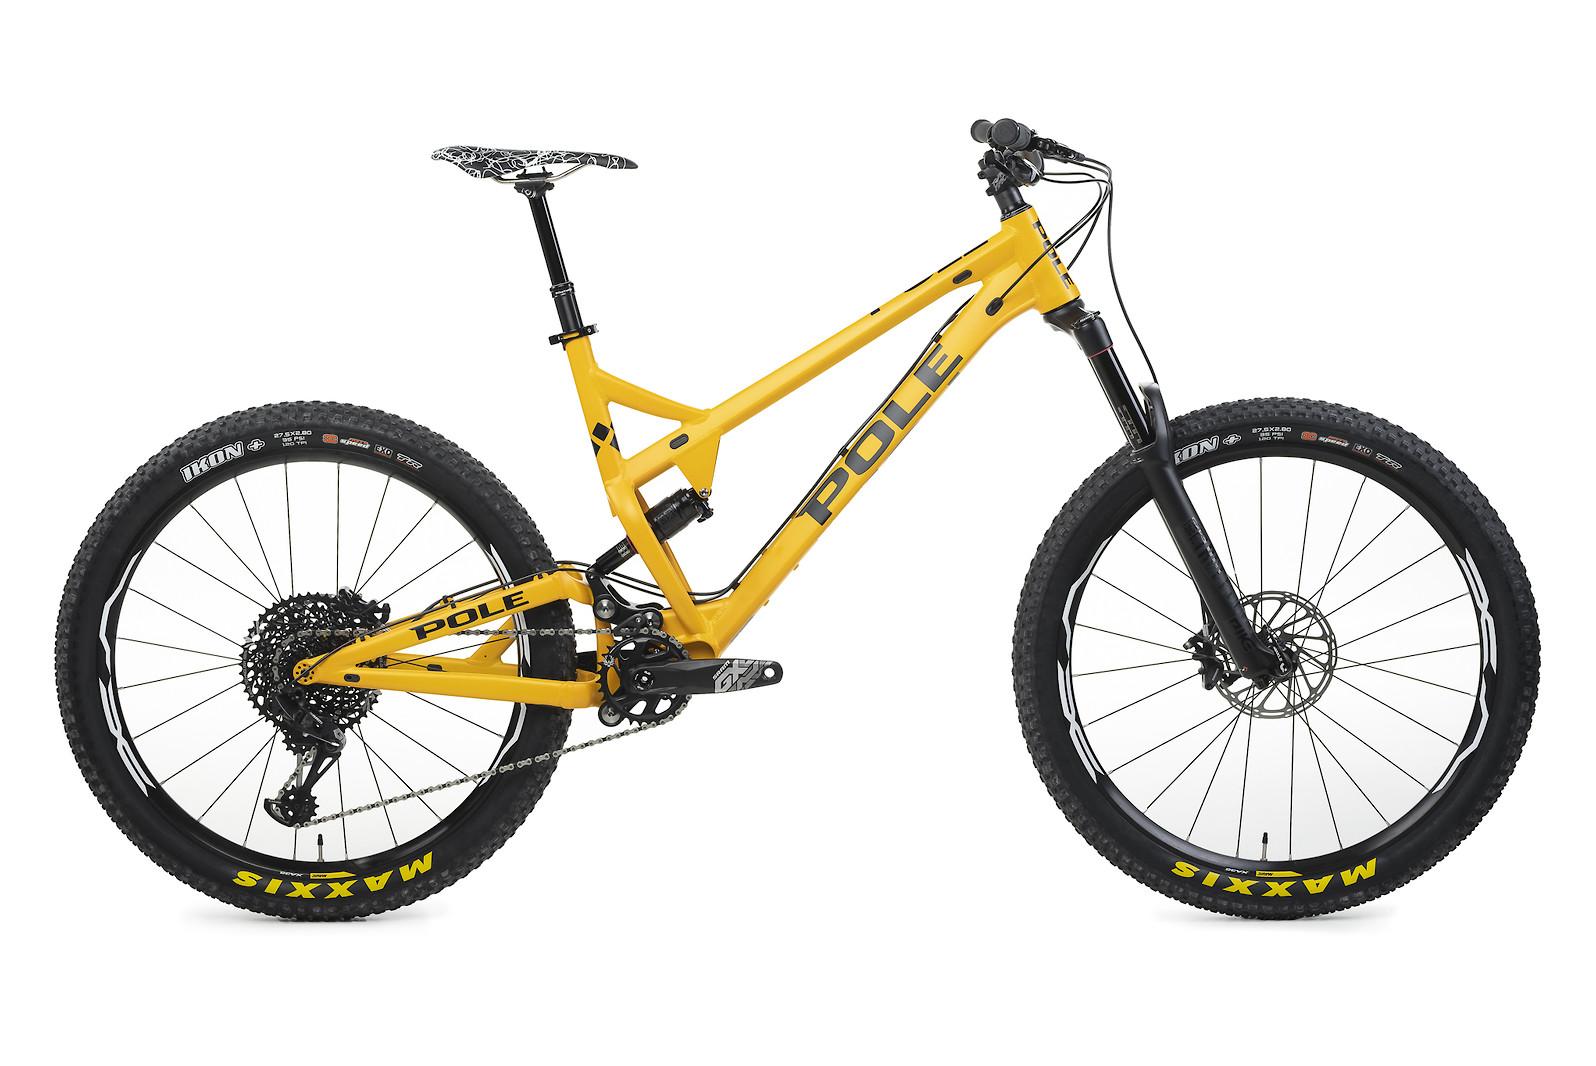 2020 Pole Evolink 131 TR+ Taiga Yellow